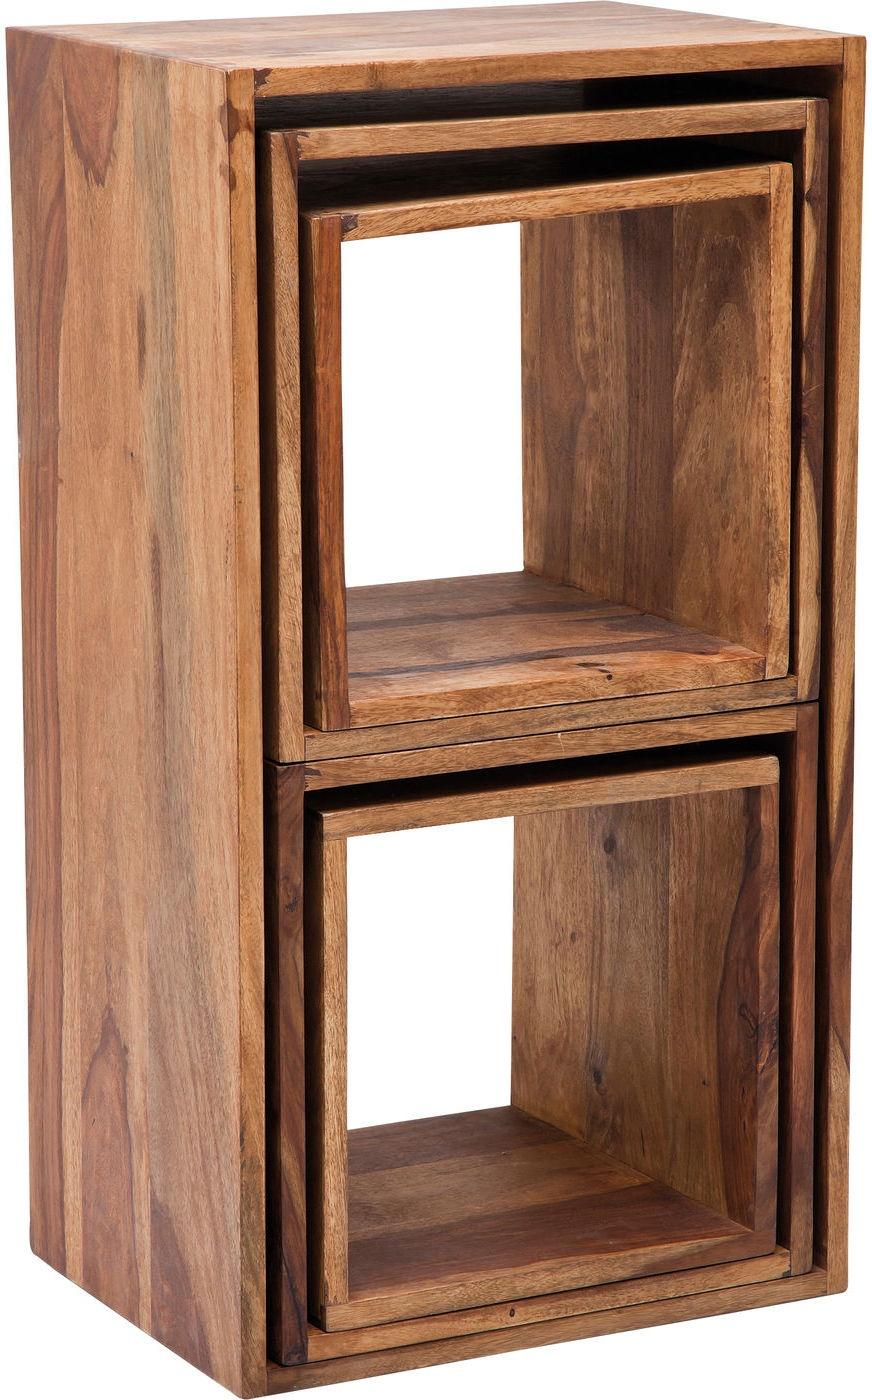 Kare Design Set 5 Bijzettafels Authentico Cube - Sheesham Hout